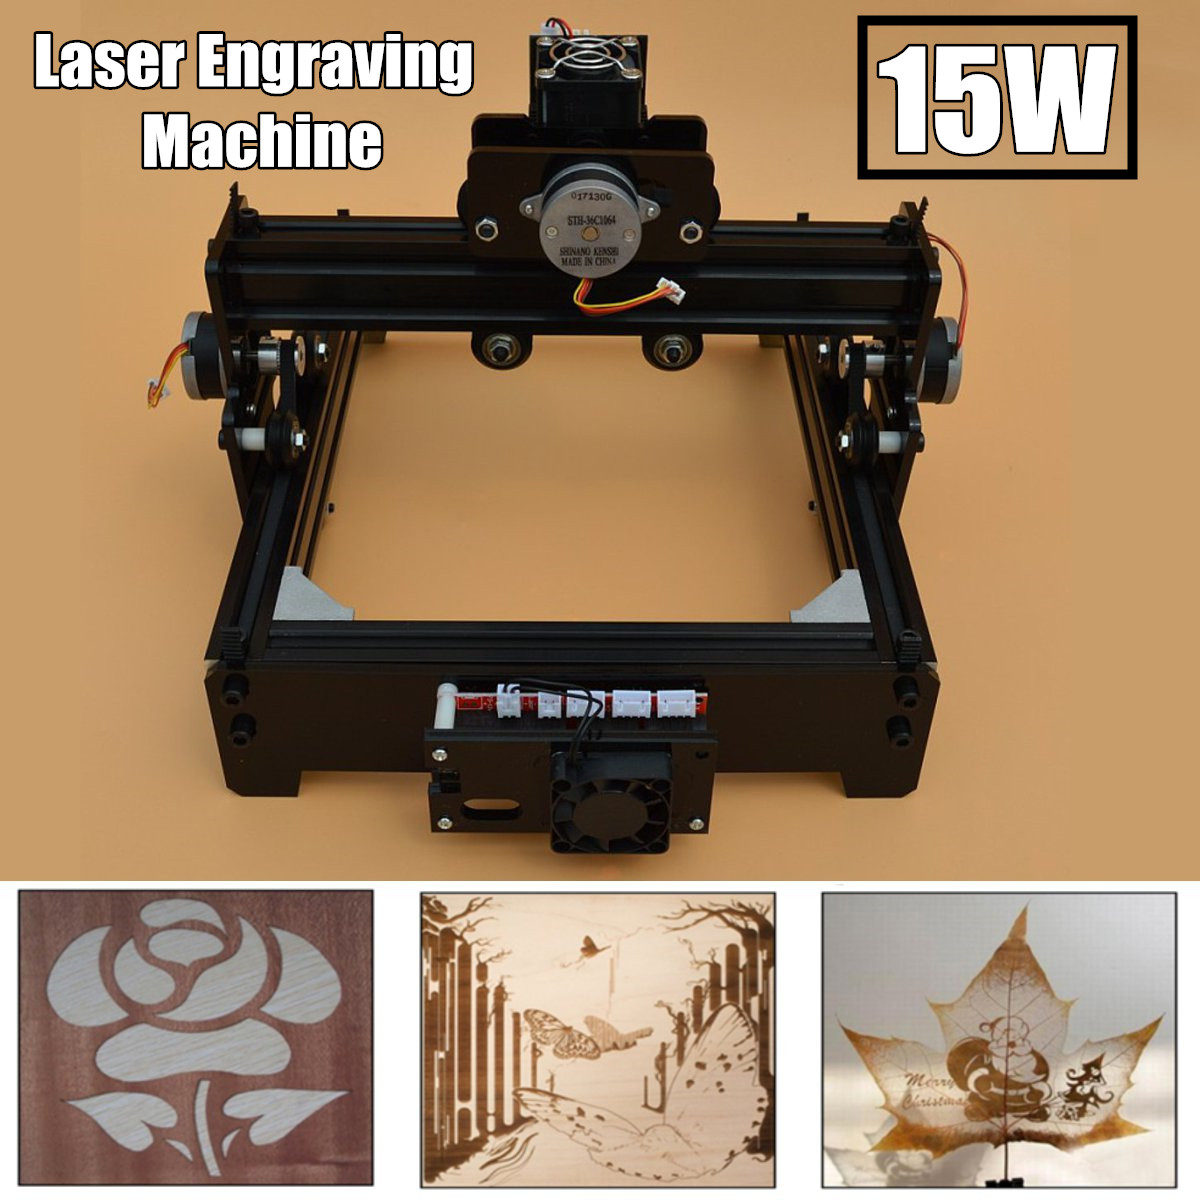 Desktop Laser Engraving Machine 15W USB DC 12V 4A CNC Metal Marking Printer  High Precision